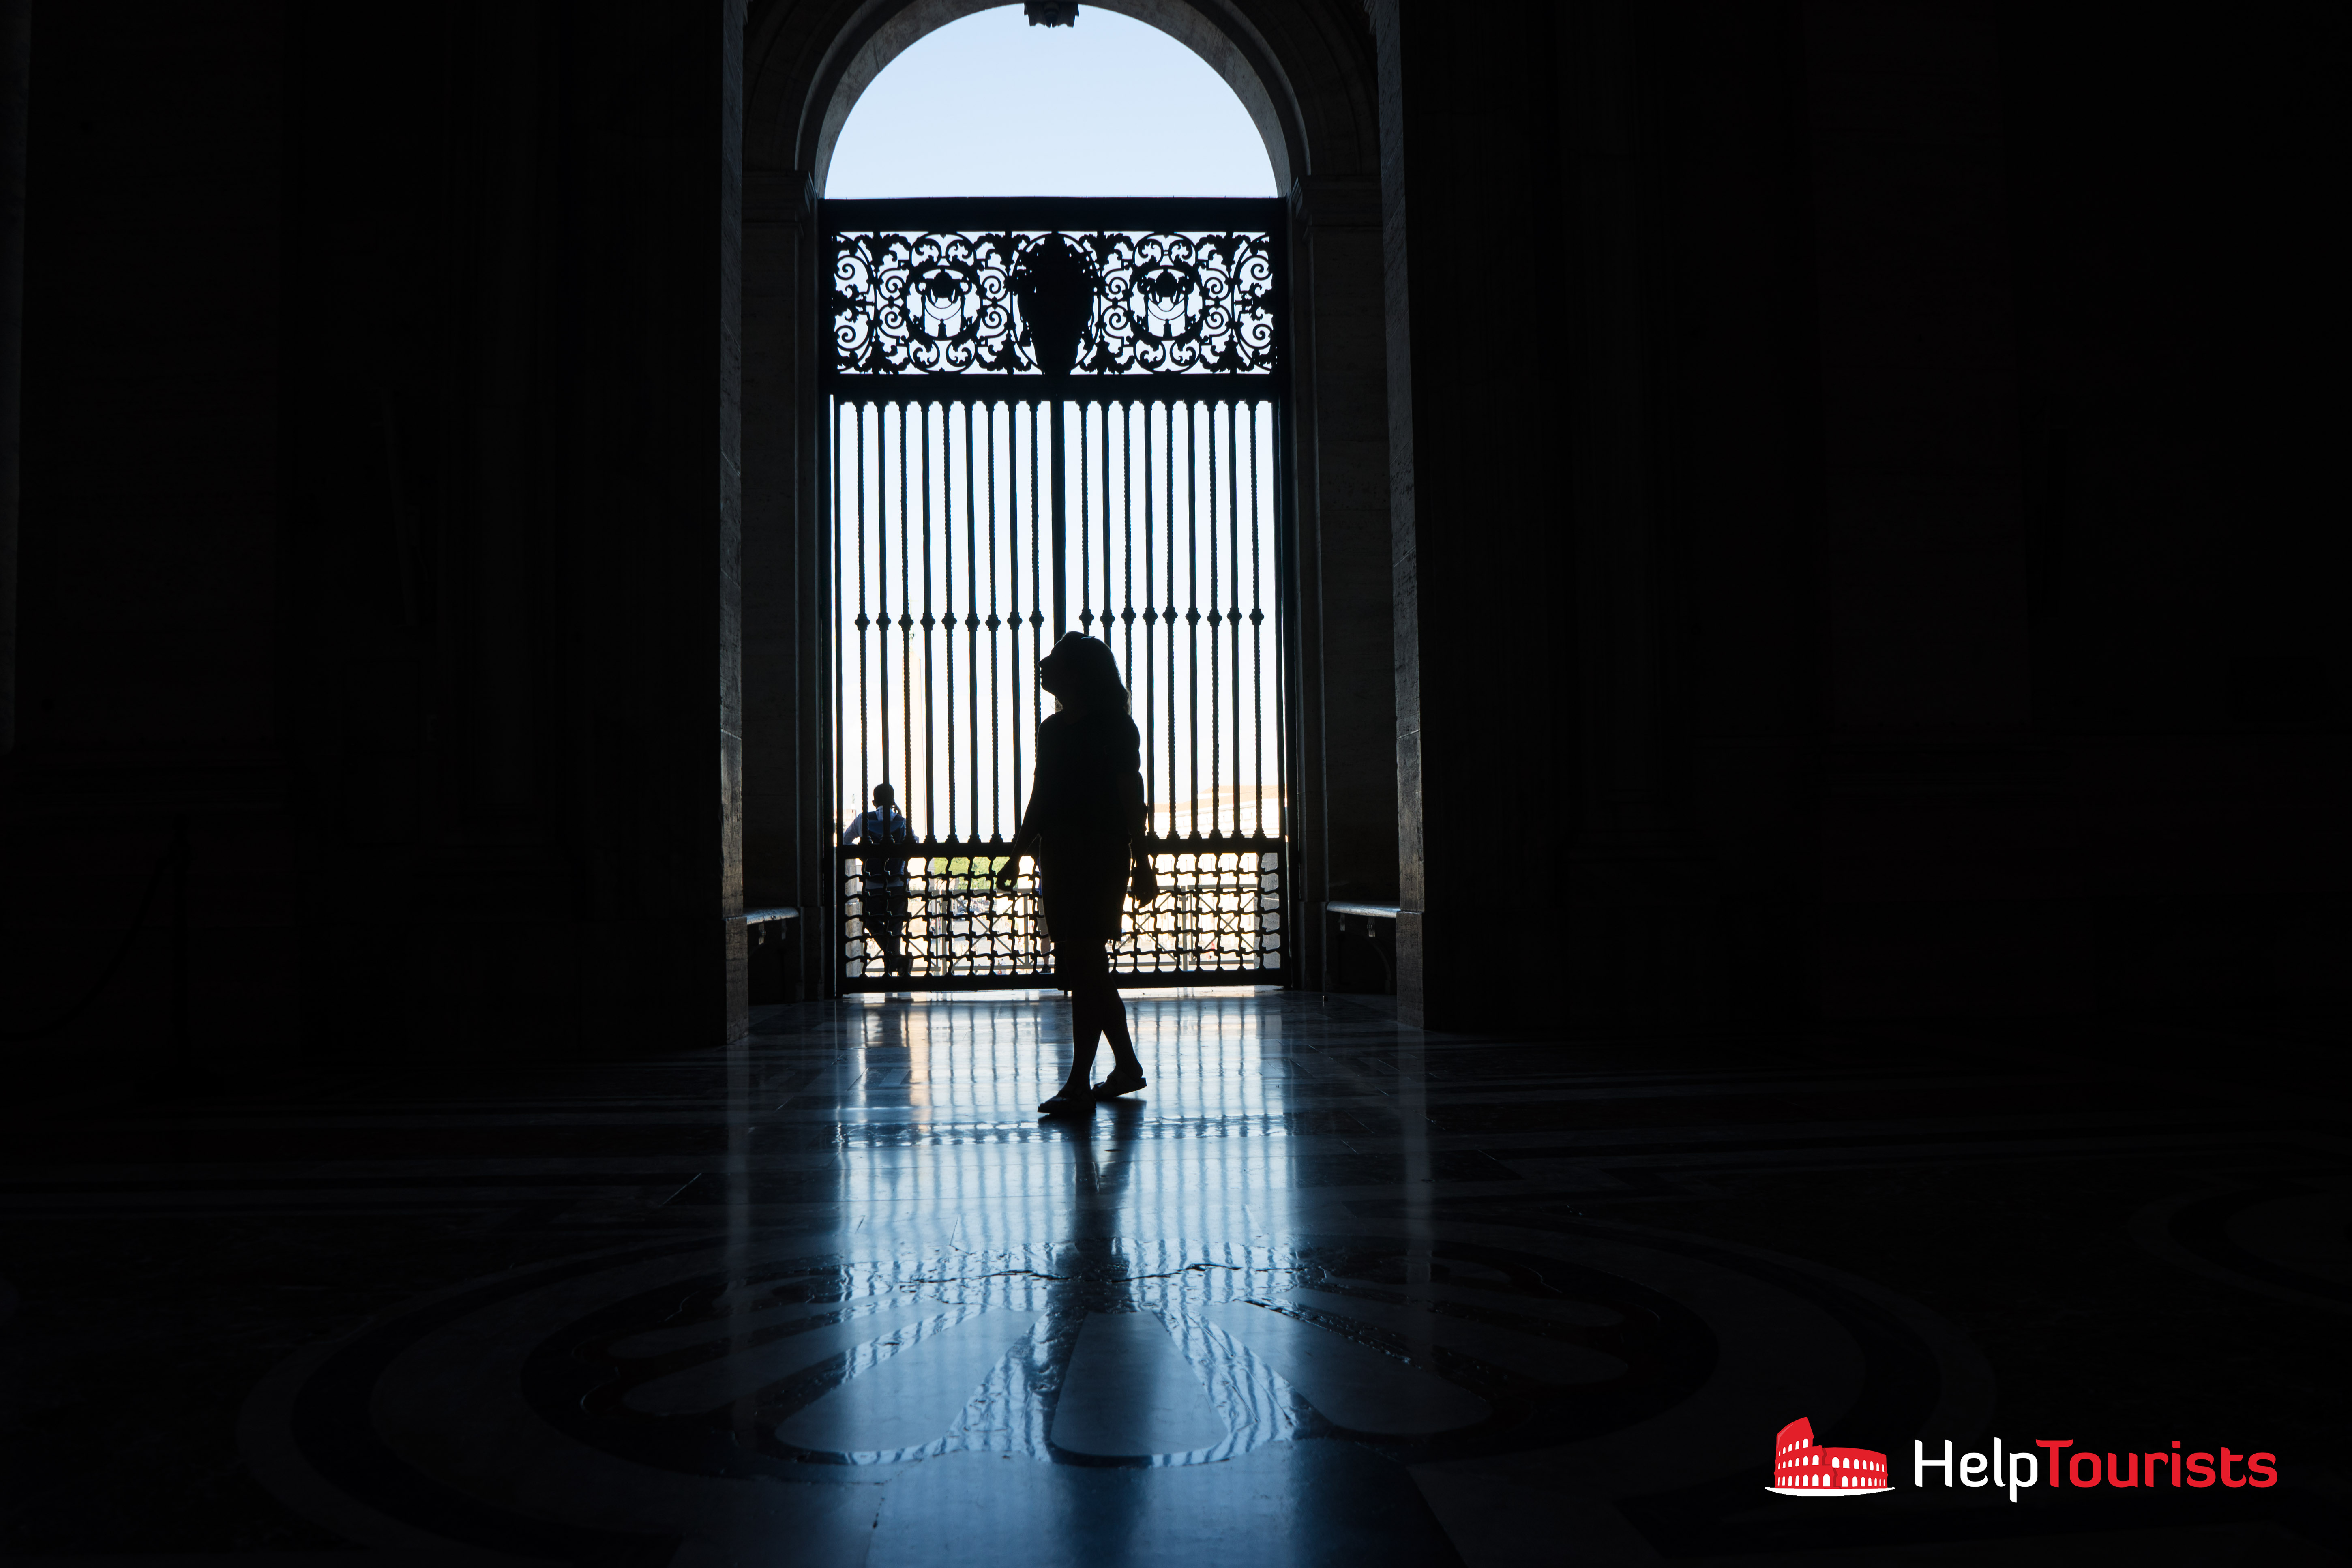 ROME_St_Peter's_Basilica_exit_window_l